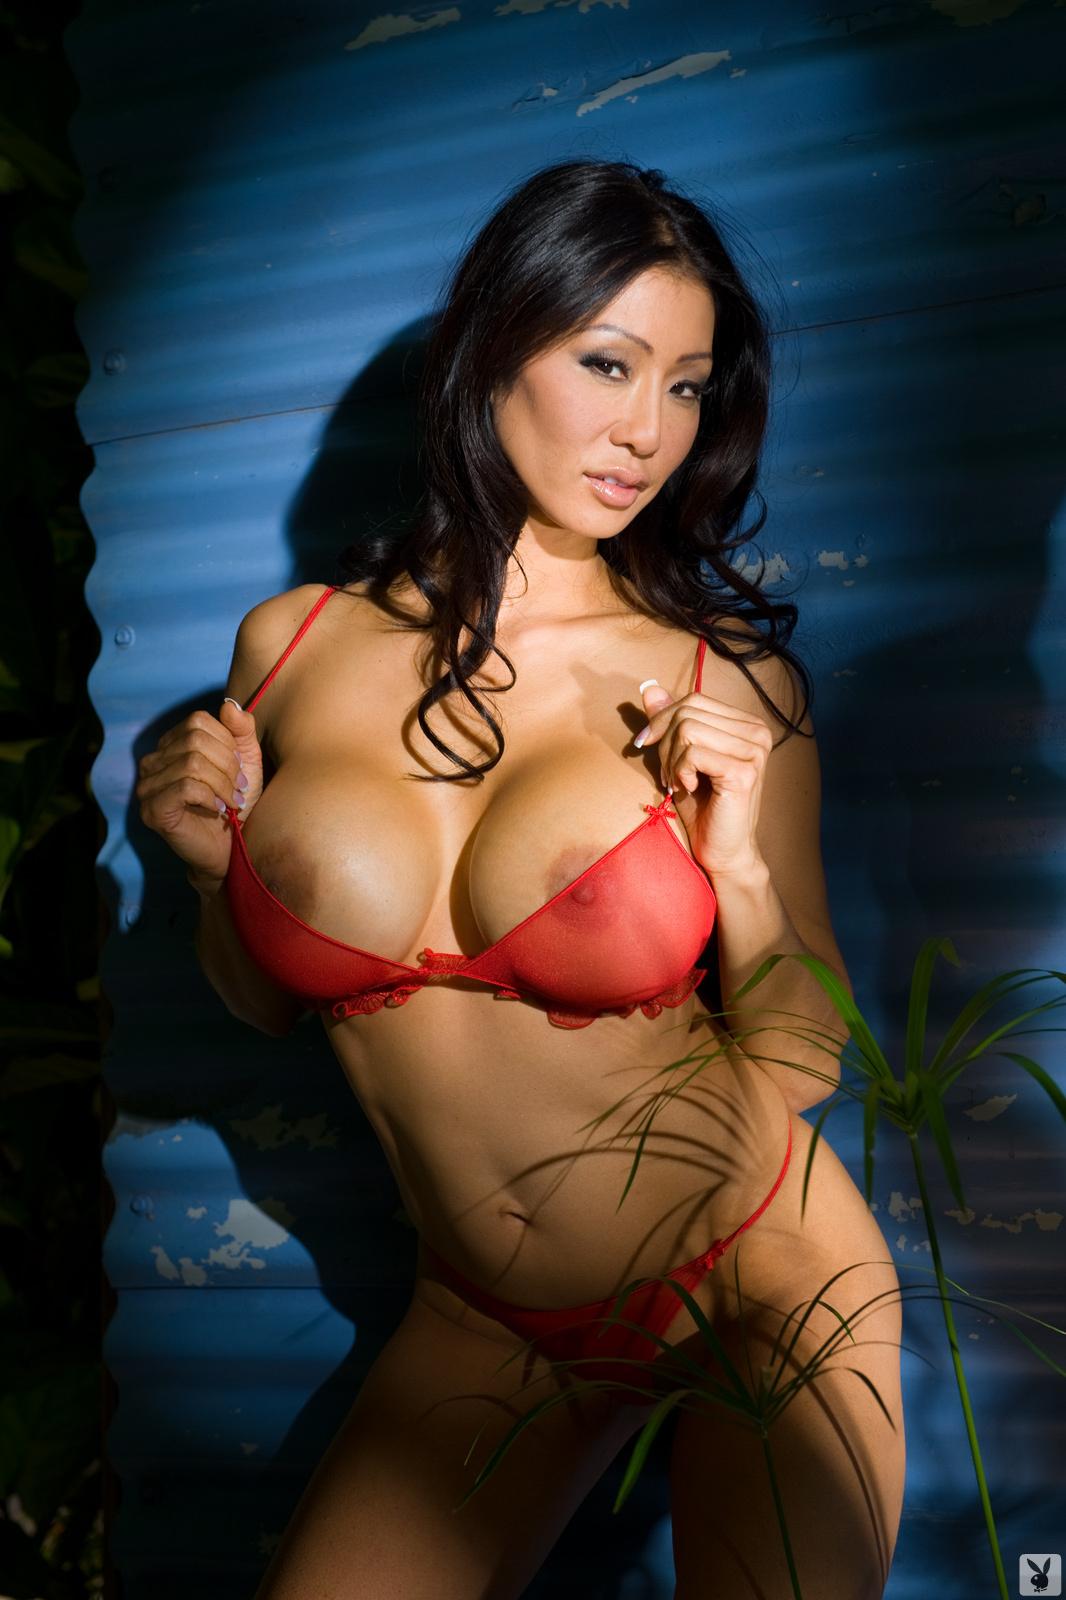 Kiana Kim Nude On Playboy Plus (7)